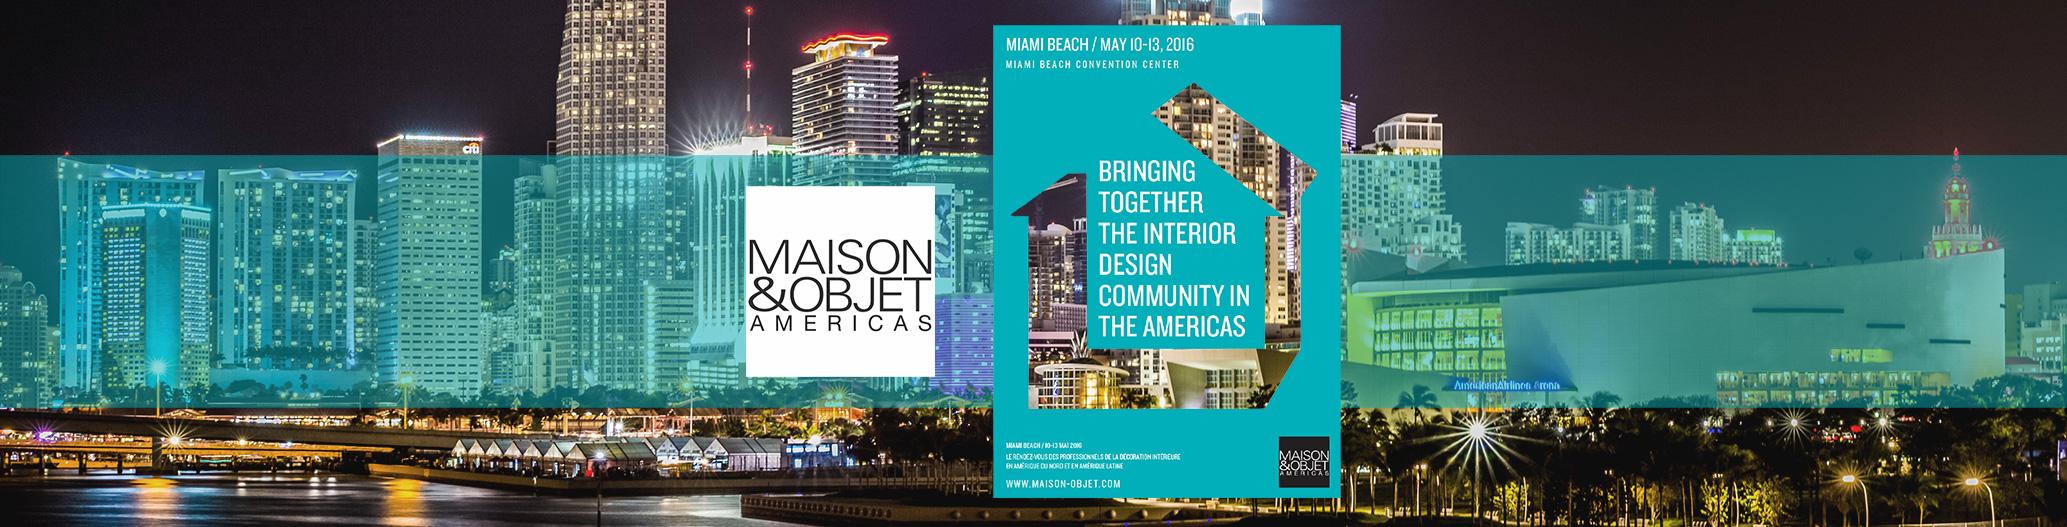 Maison & Objet Americas 2016